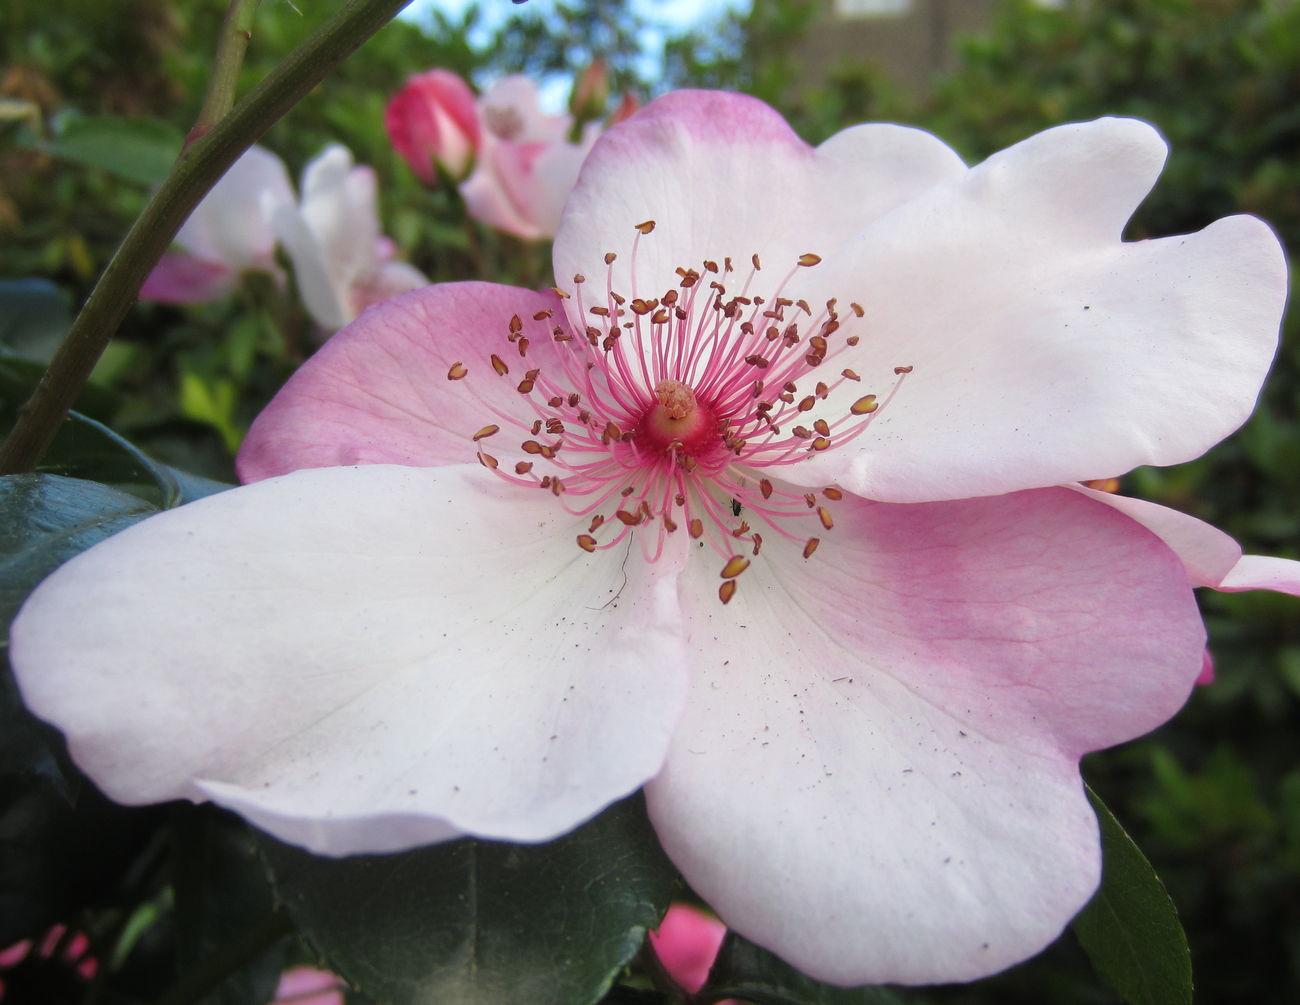 My_rose_collection BeautyAndMadness Eye Em Best Shots Floralperfection